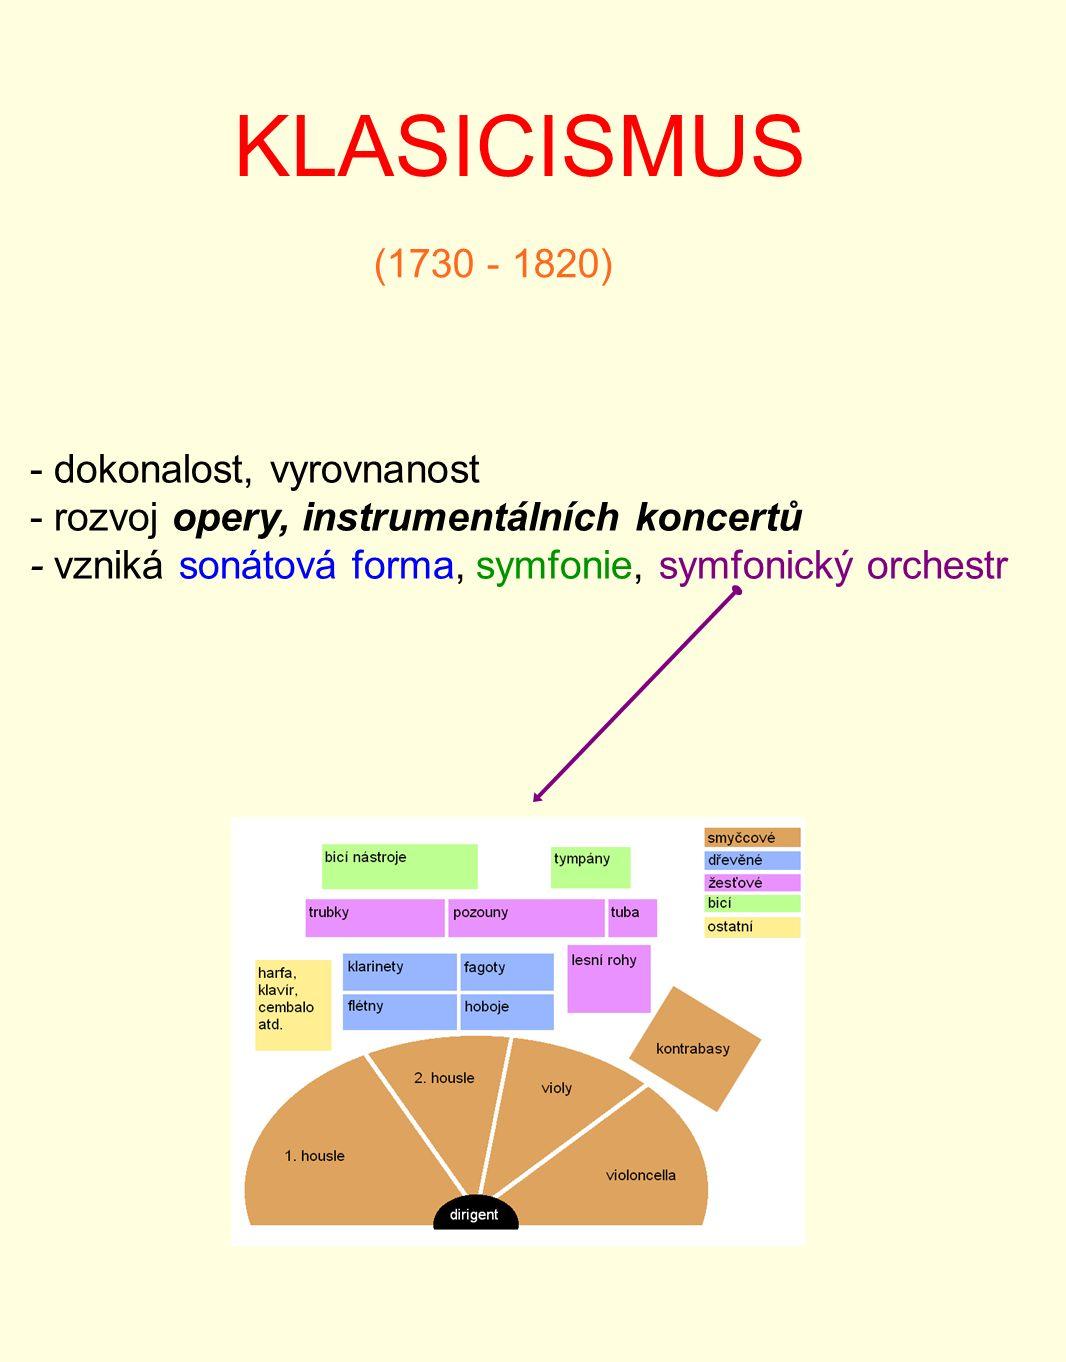 RATIGAN (INSTRUMENT ET PHOTO): Soubor:Clavecin flamand.png [online].